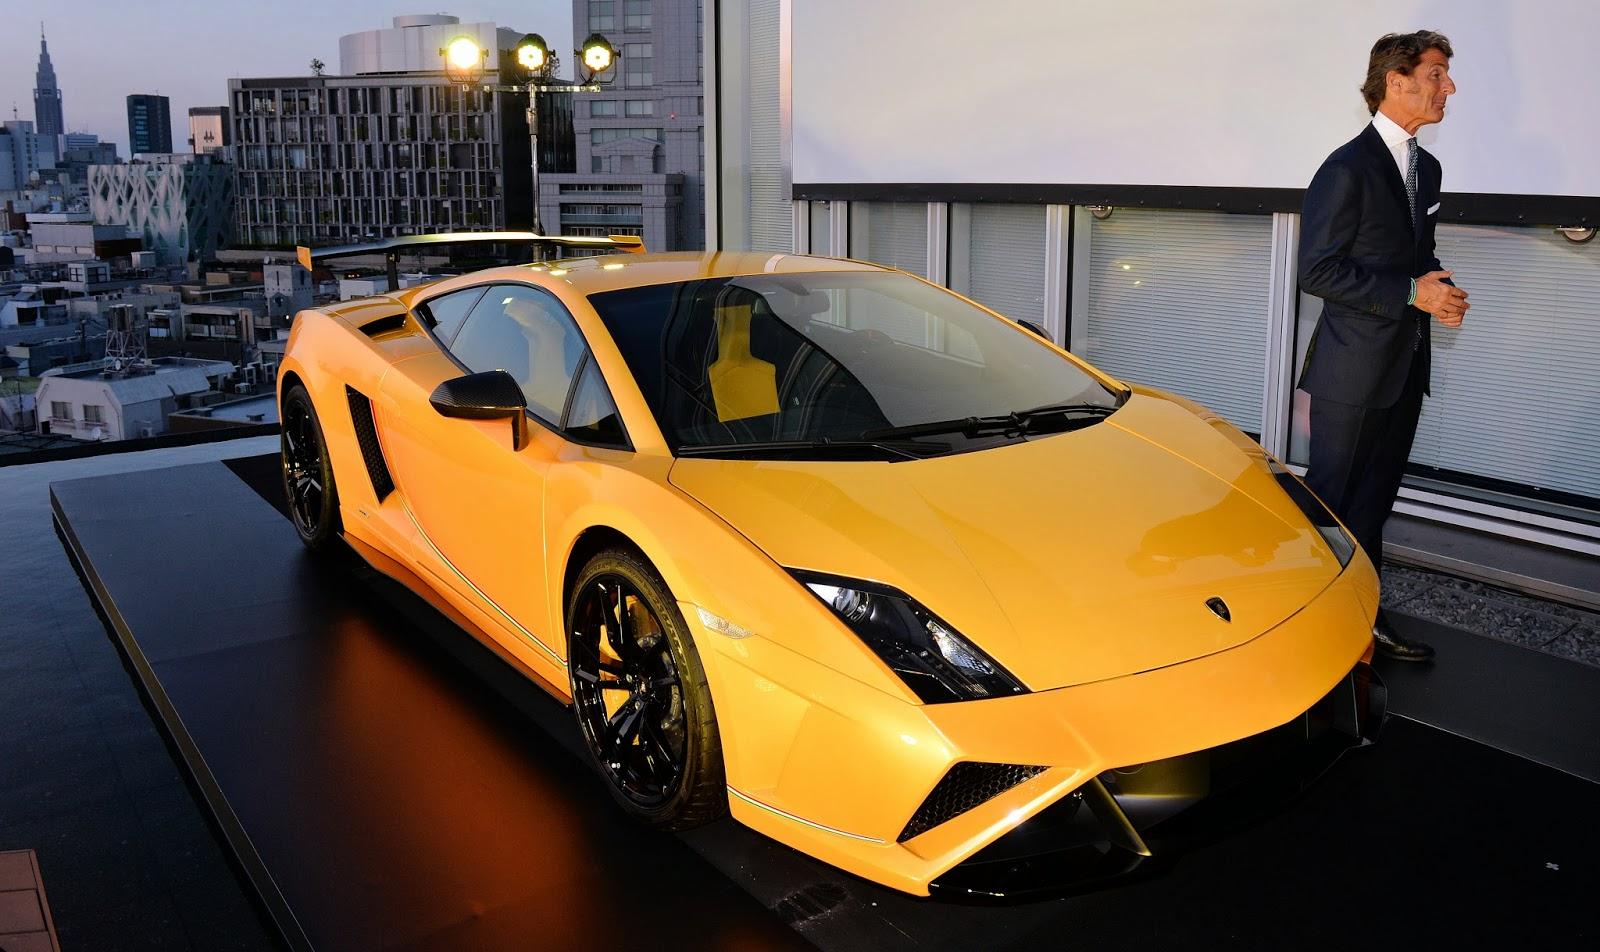 Auto, Auto Industry, Automobile, Business, CEO, Economy, Frankfurt Motor Show, Gallardo LP 570-4 Squadra Corse, Lamborghini, Lamborghini Sports Car, Motor Show, Sports Car, Stephan Winkelmann, Tokyo,